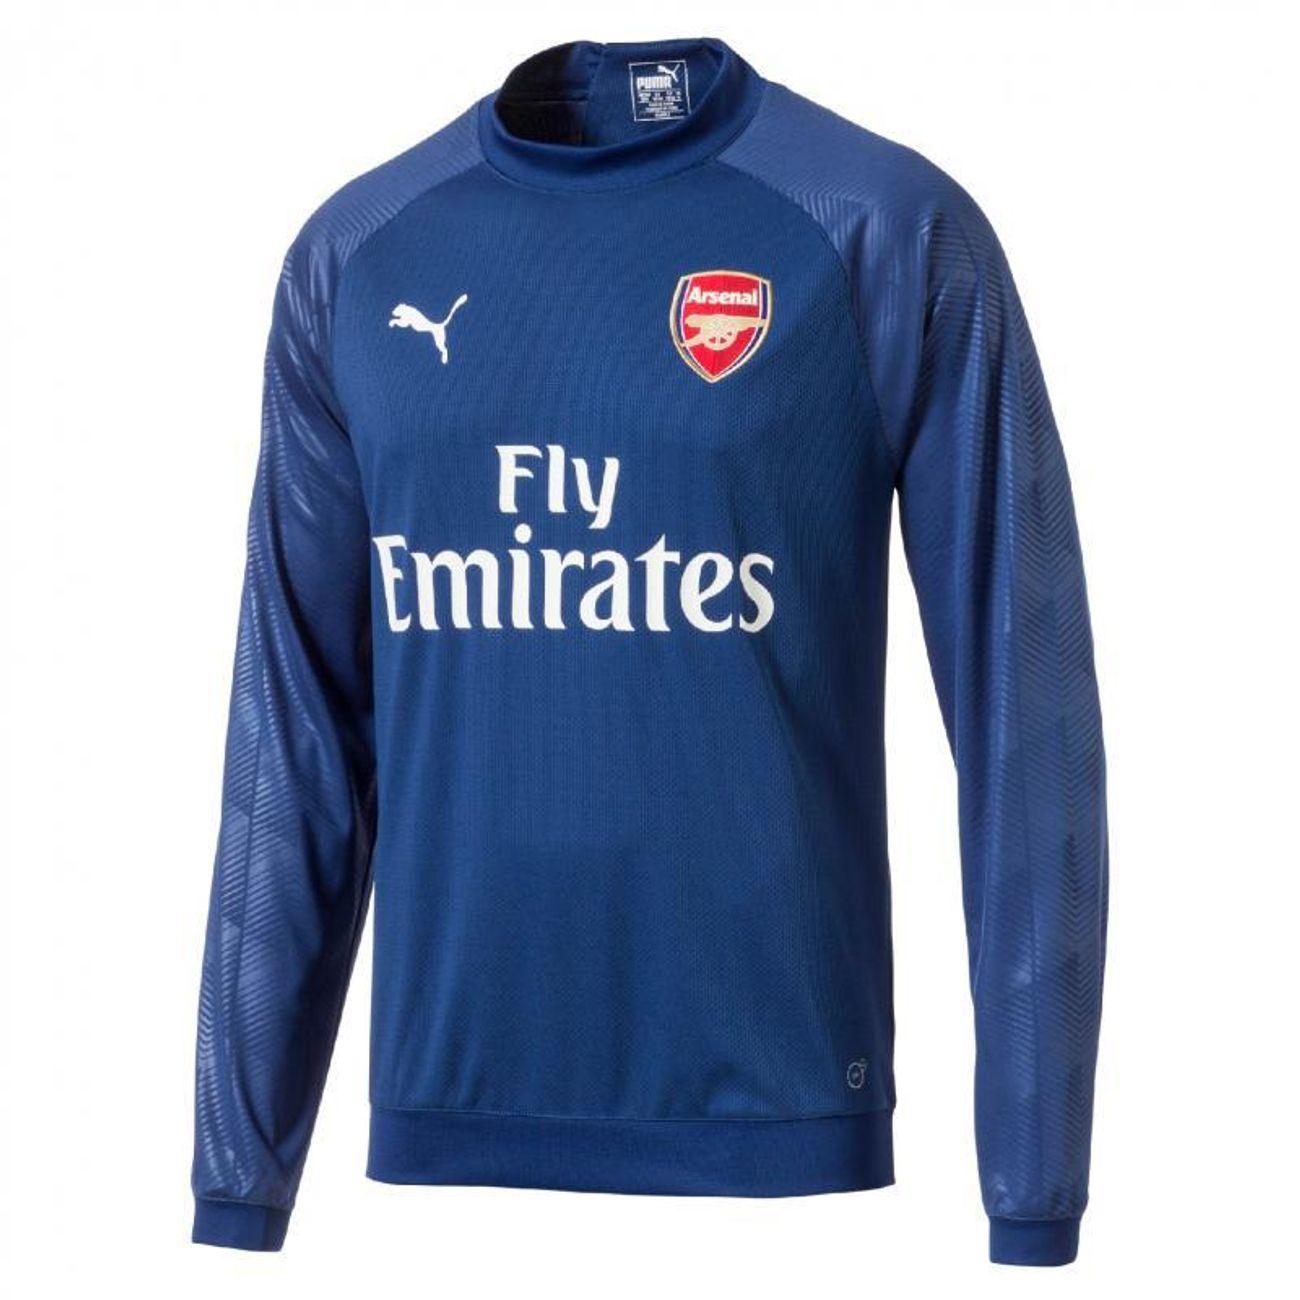 Sweatshirt Puma Arsenal - Du M au XL (Vendeur tiers)